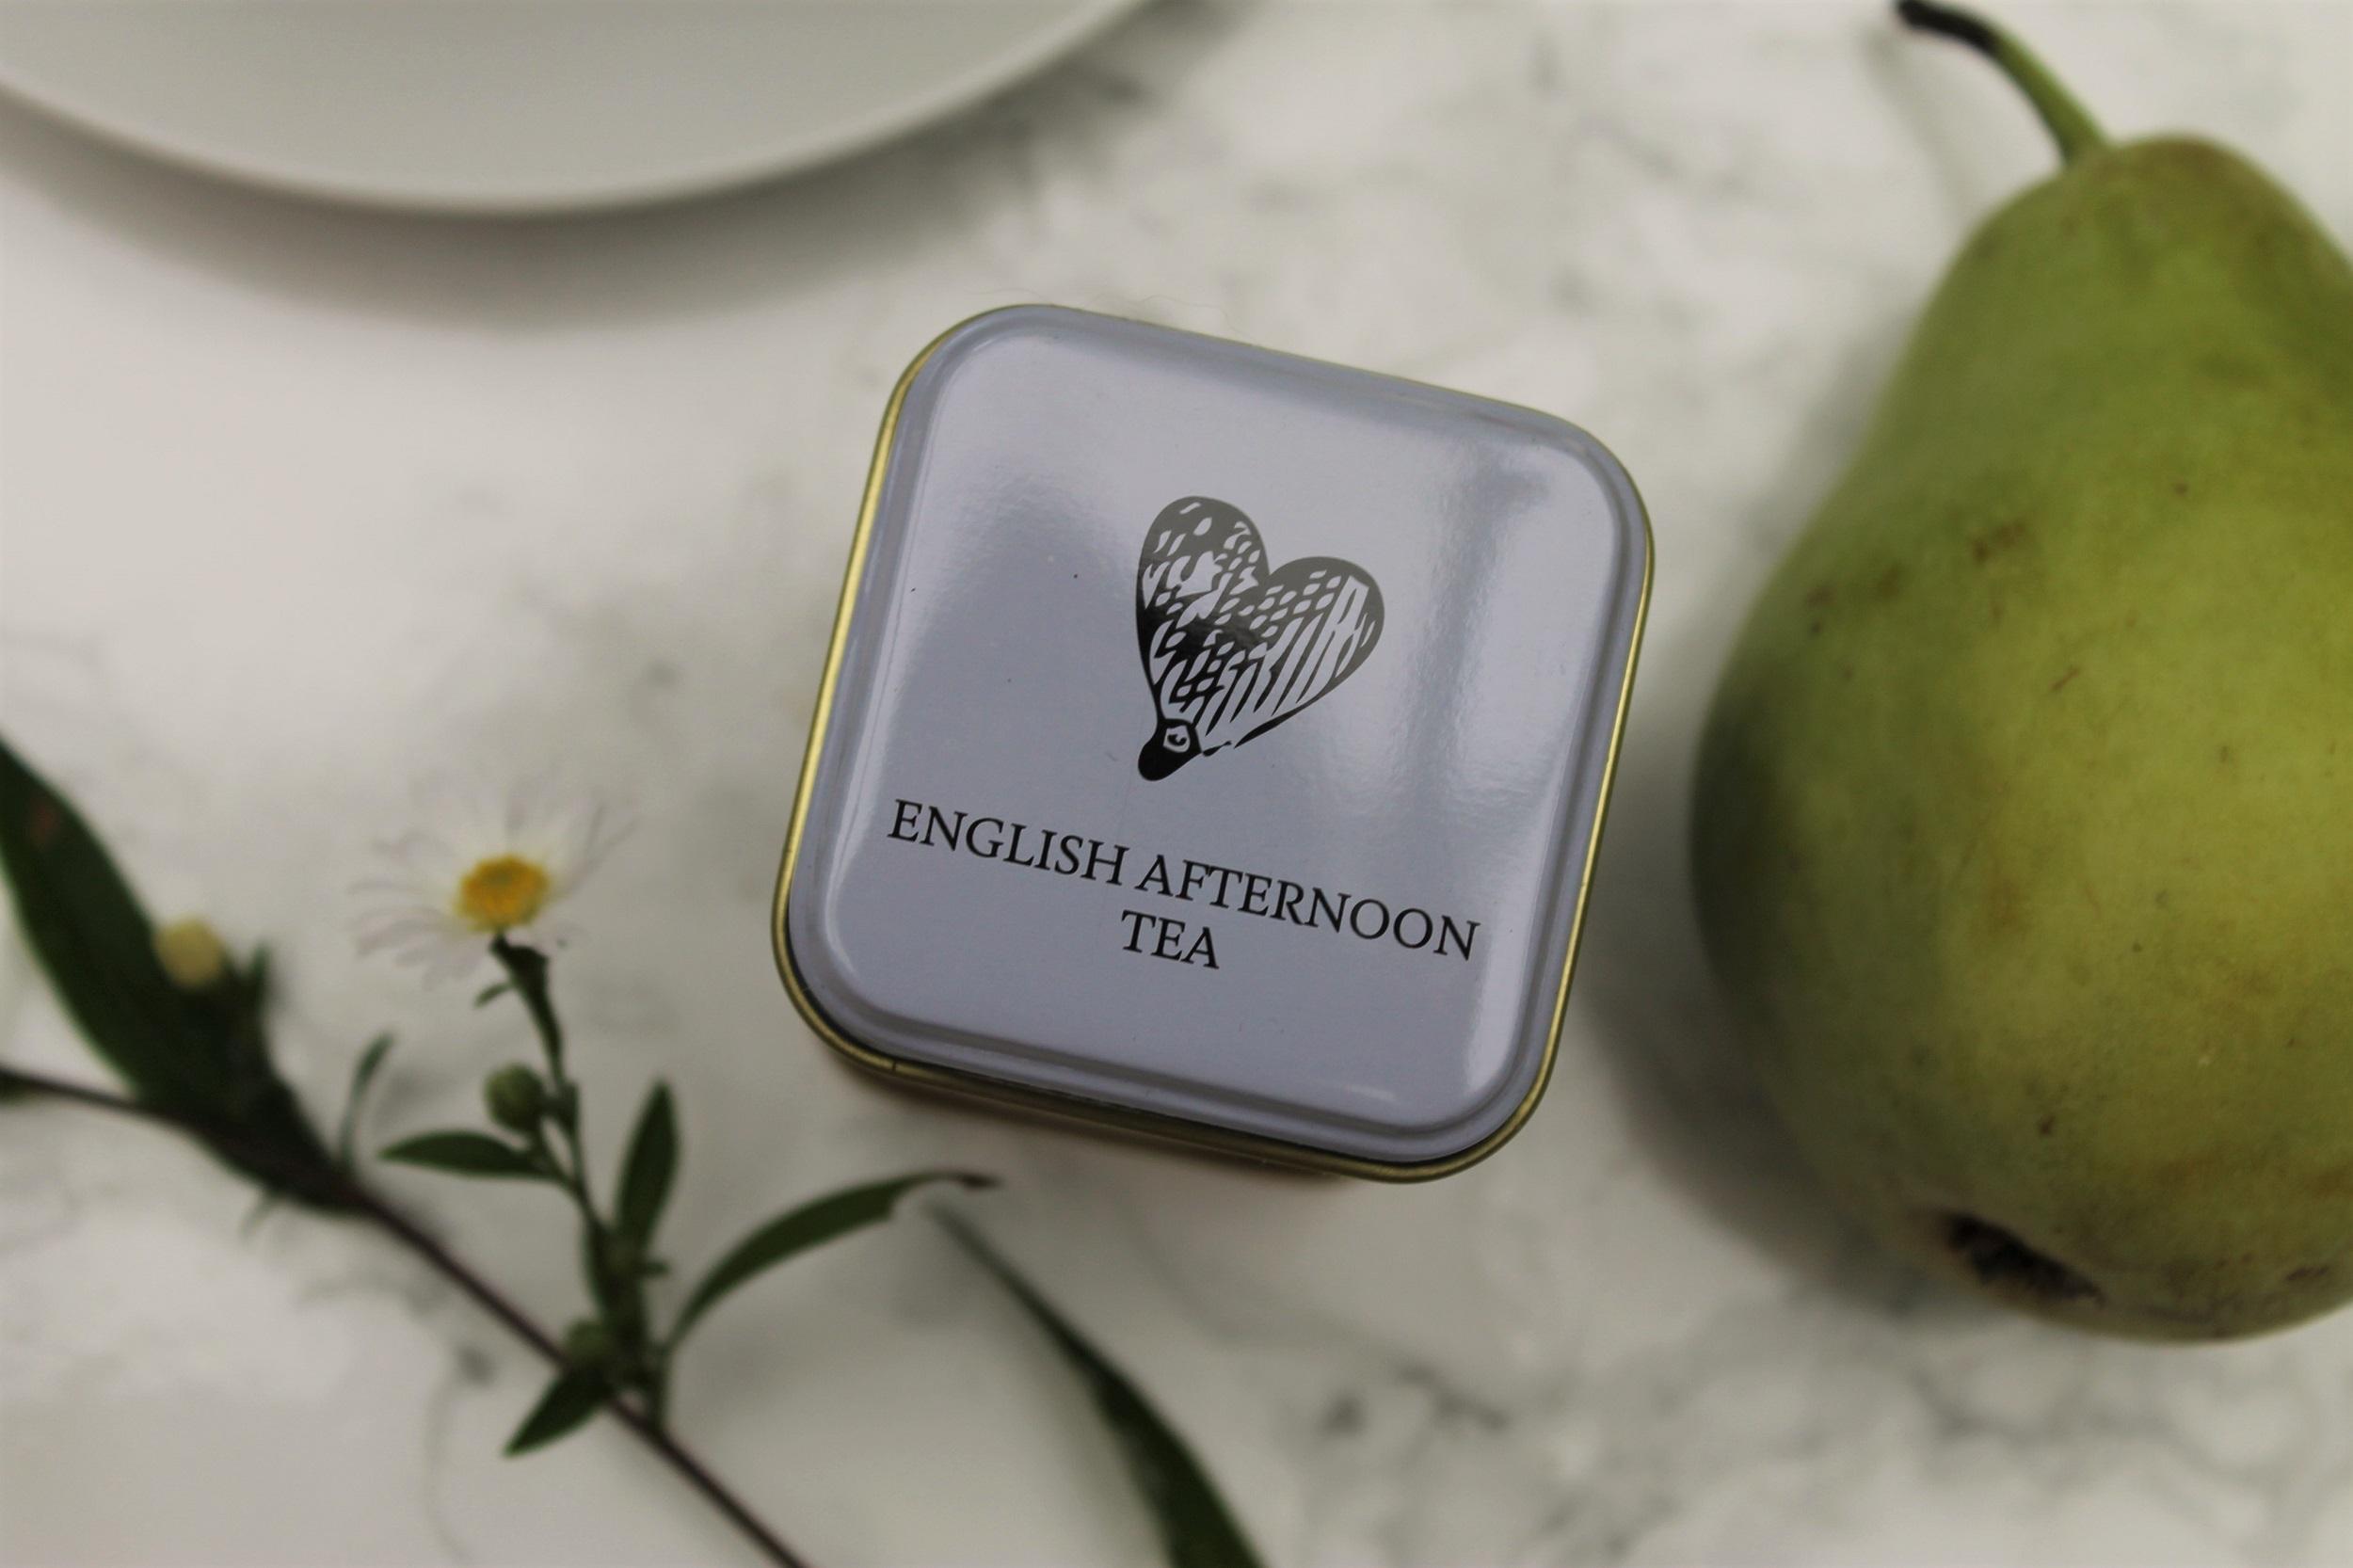 english afternoon tea tin